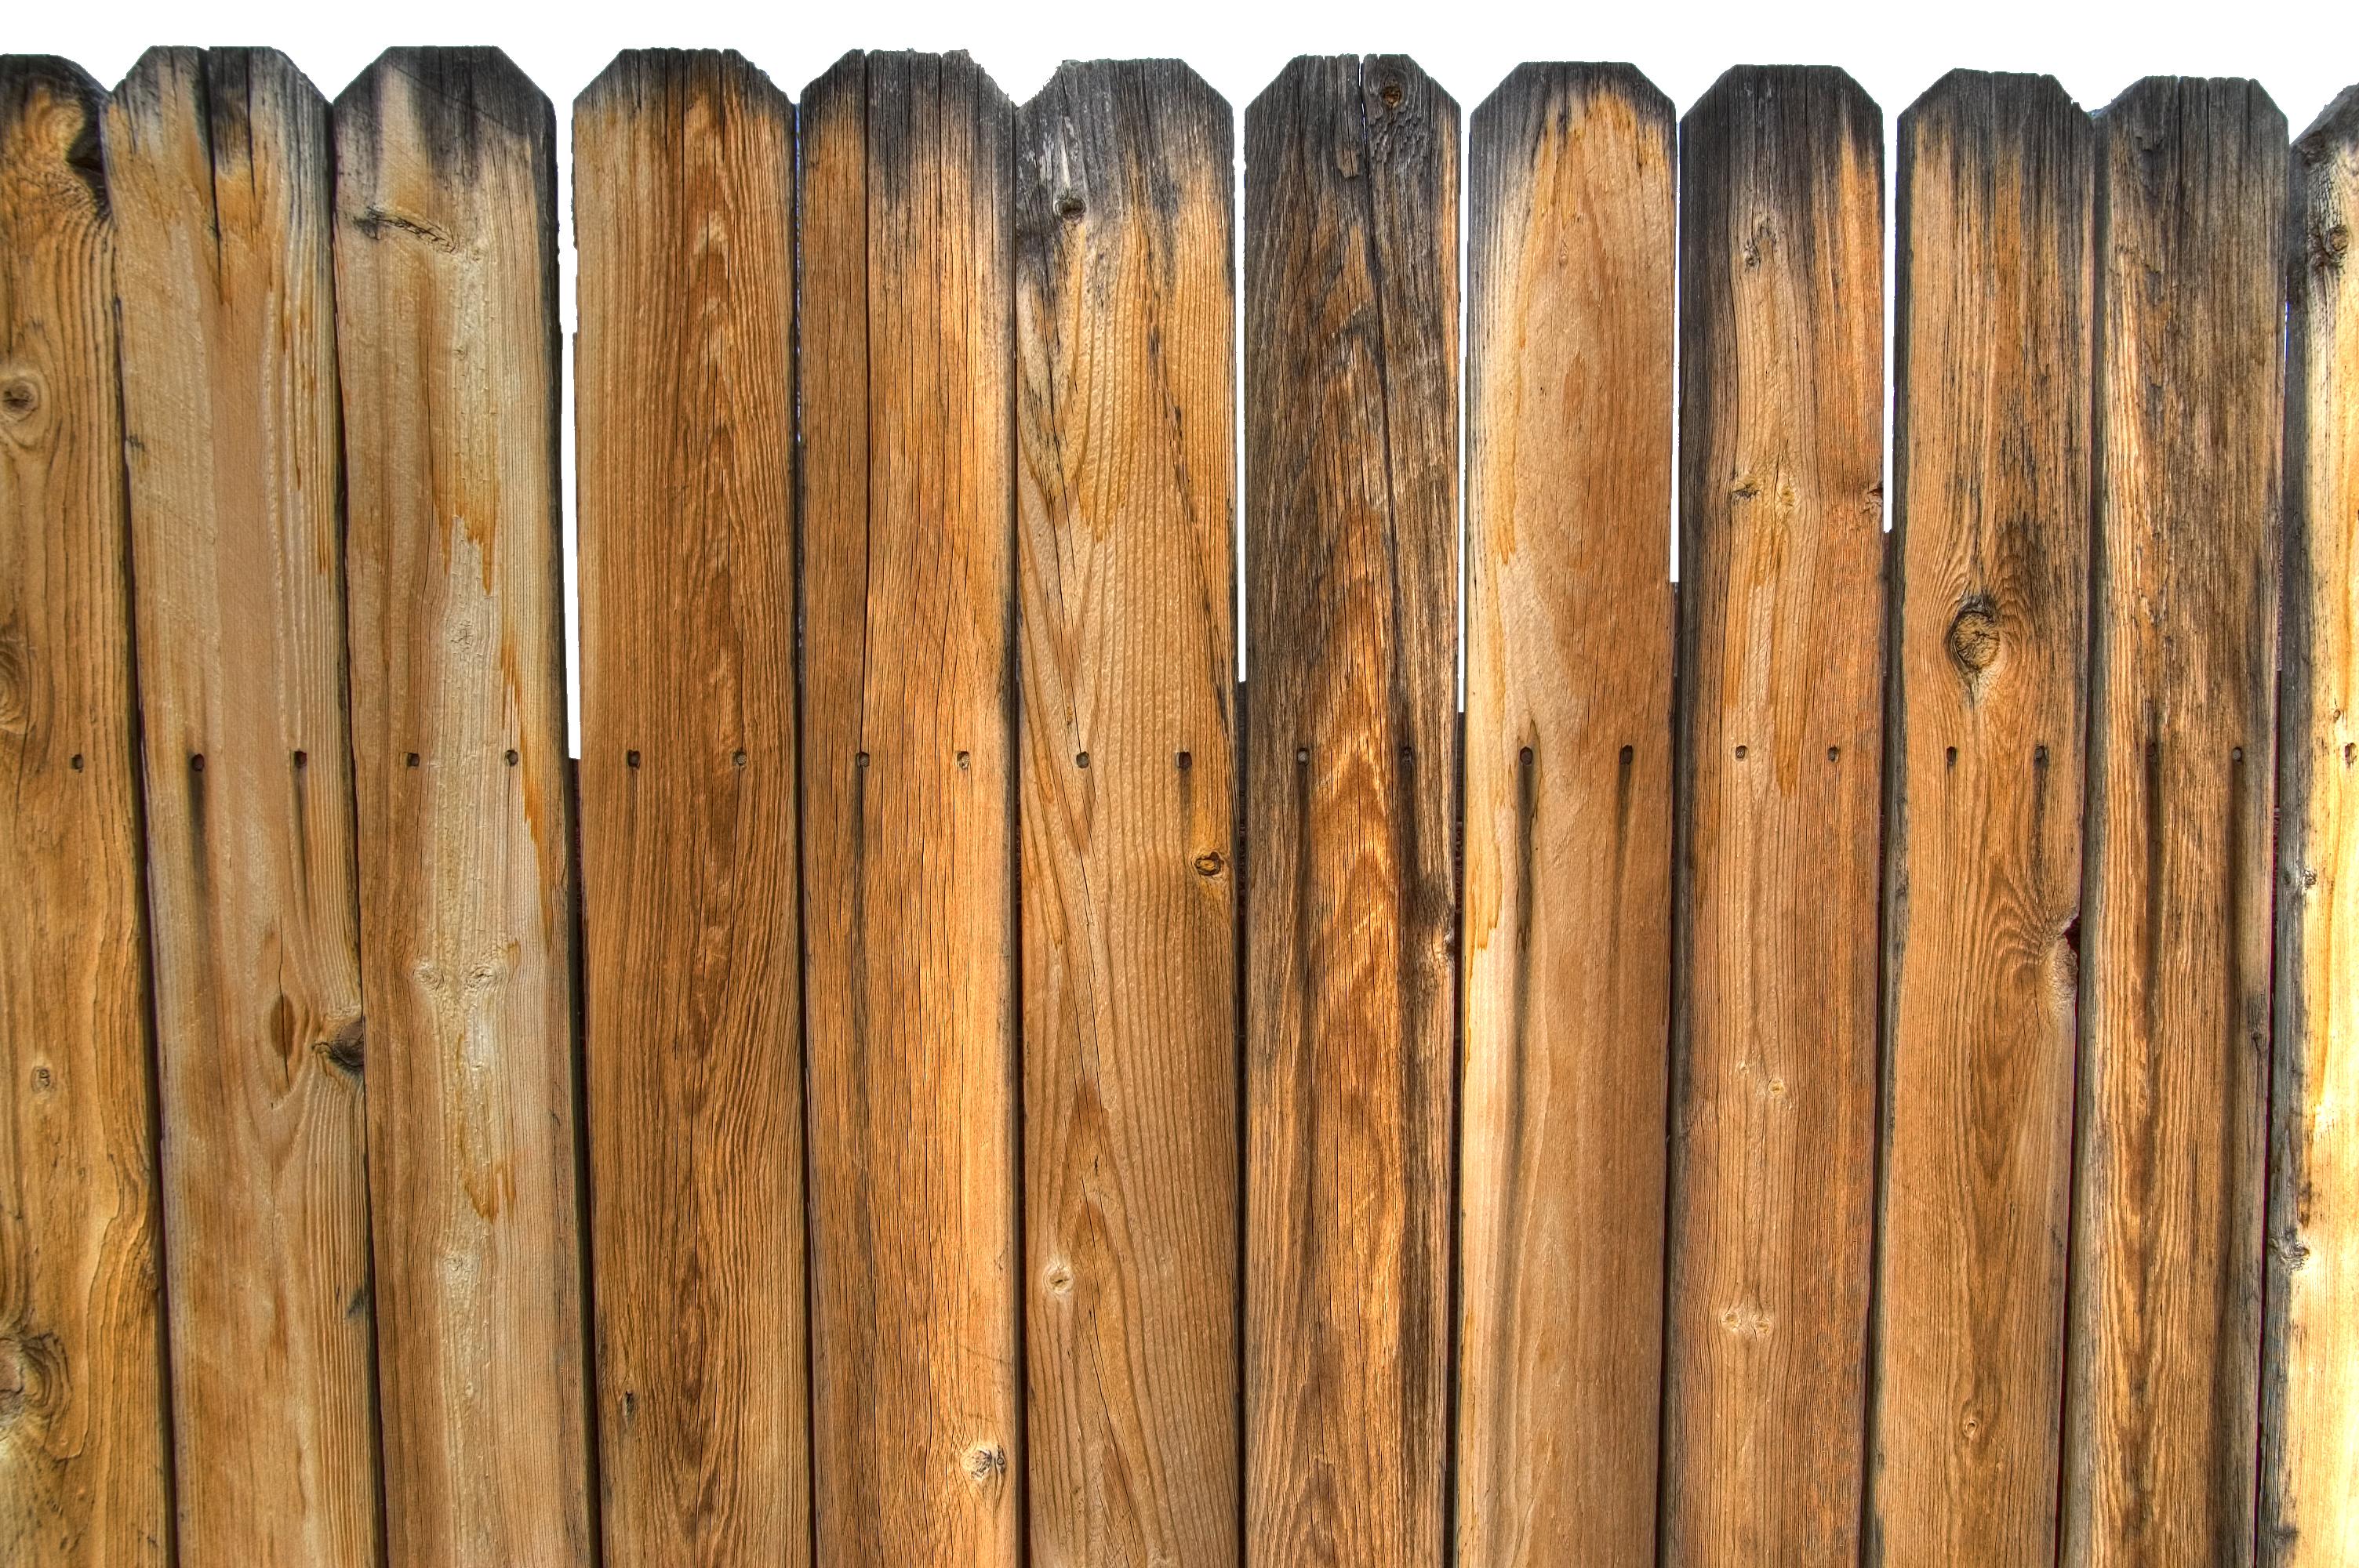 Wood fence background flickr photo sharing